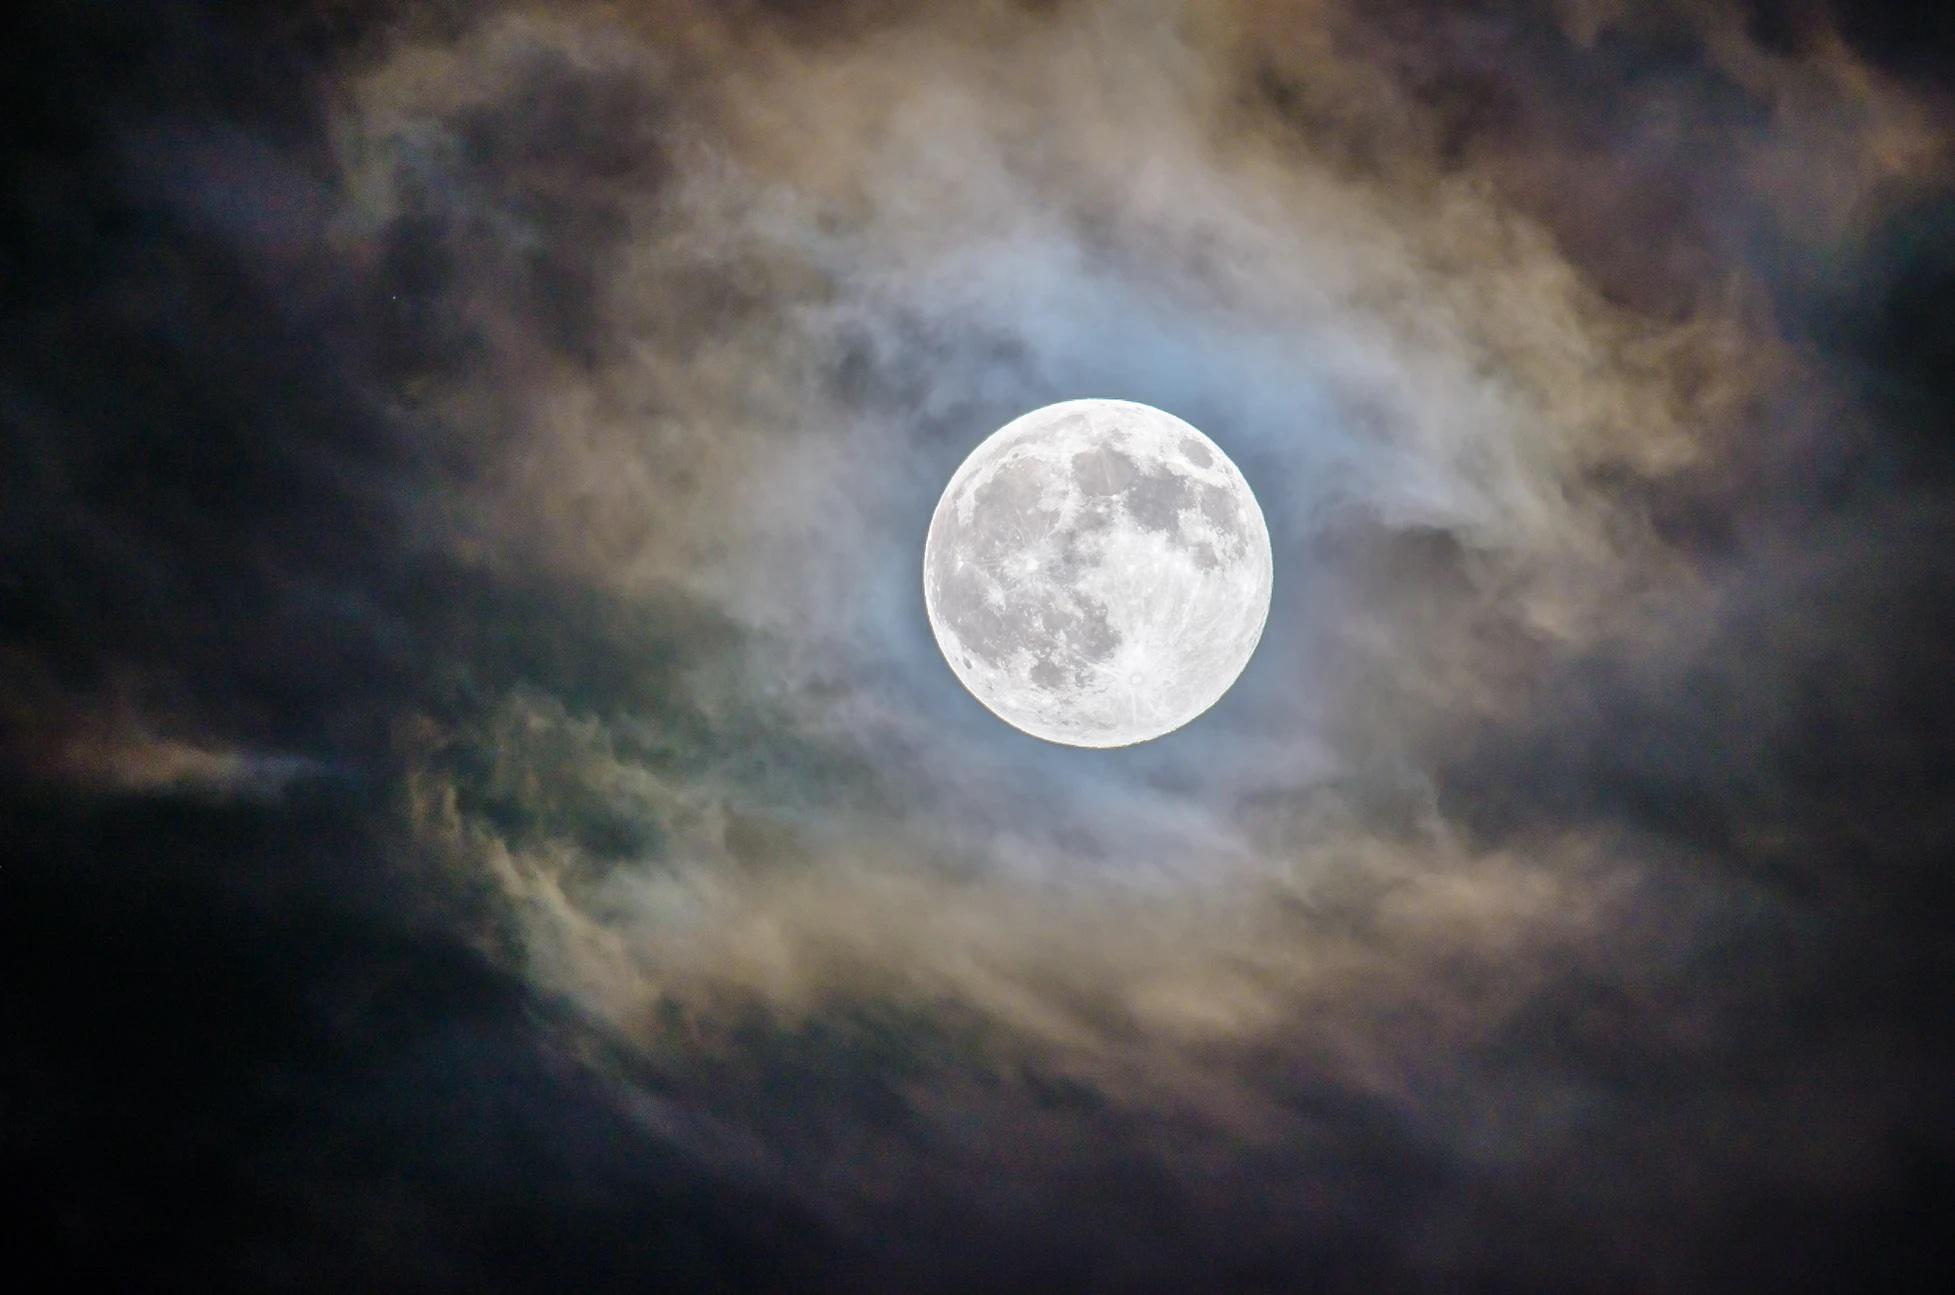 Lunar Power Over Methane Emissions